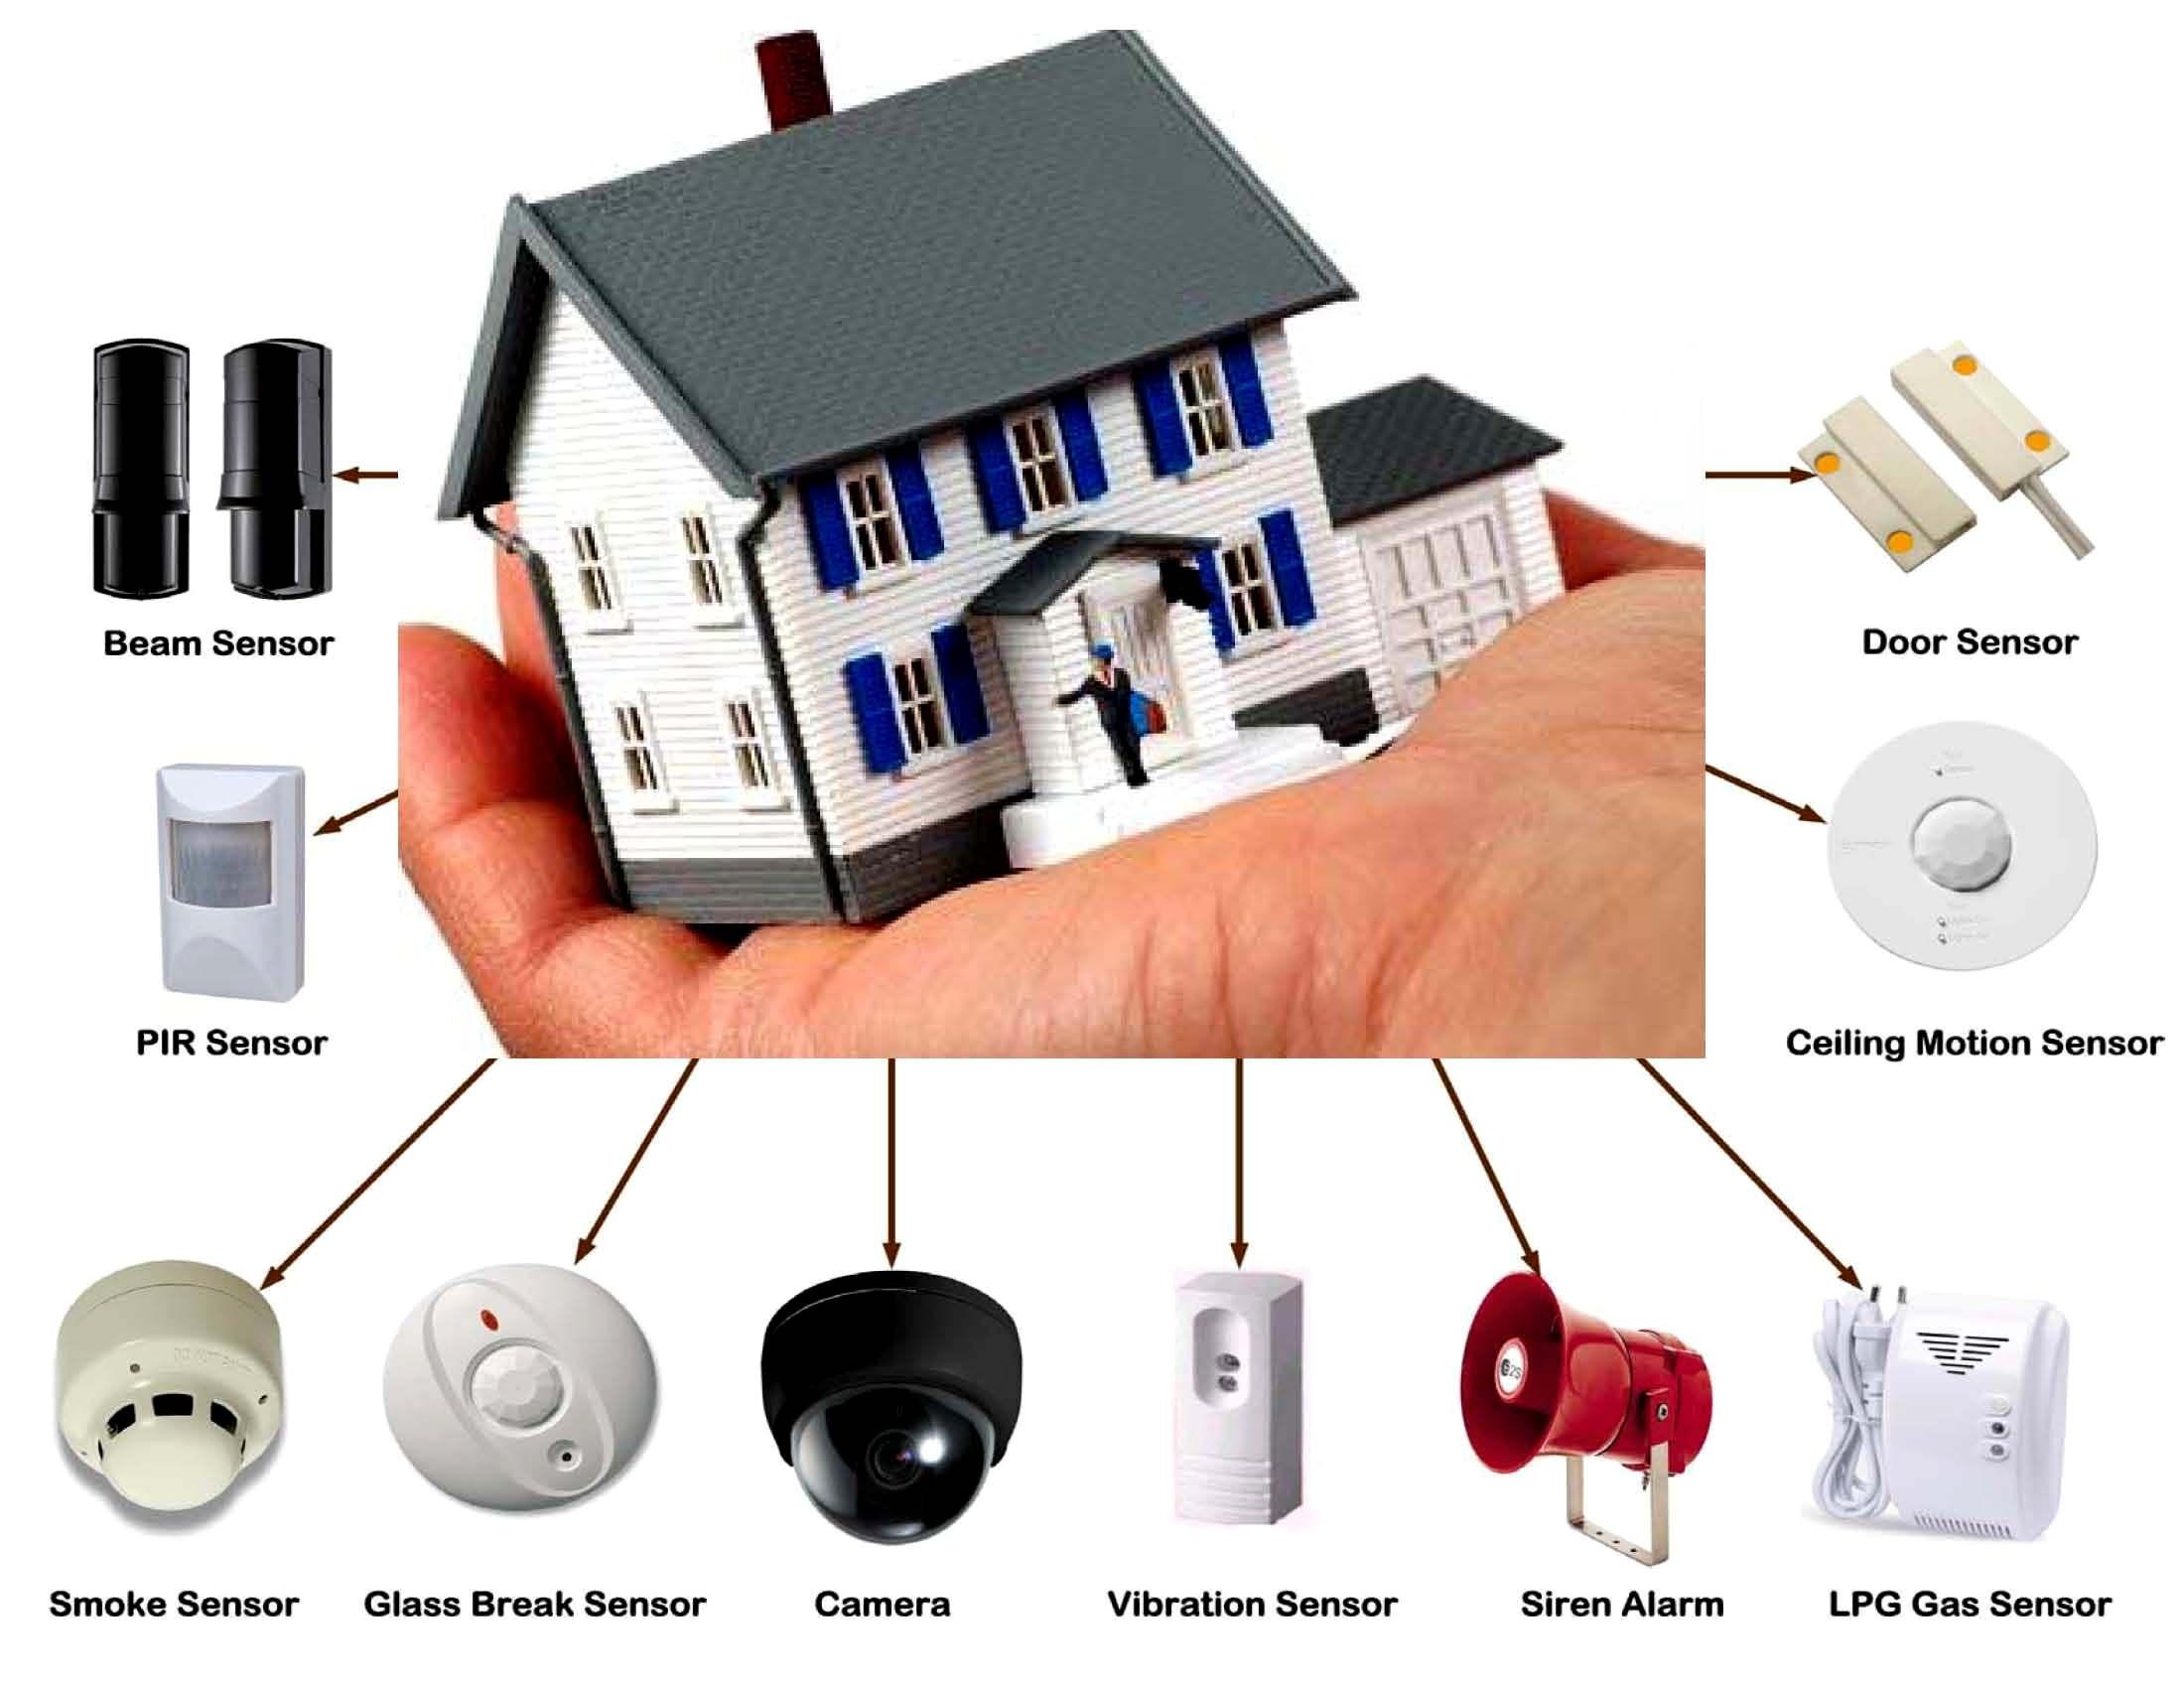 Best Home Surveillance Camera Brands